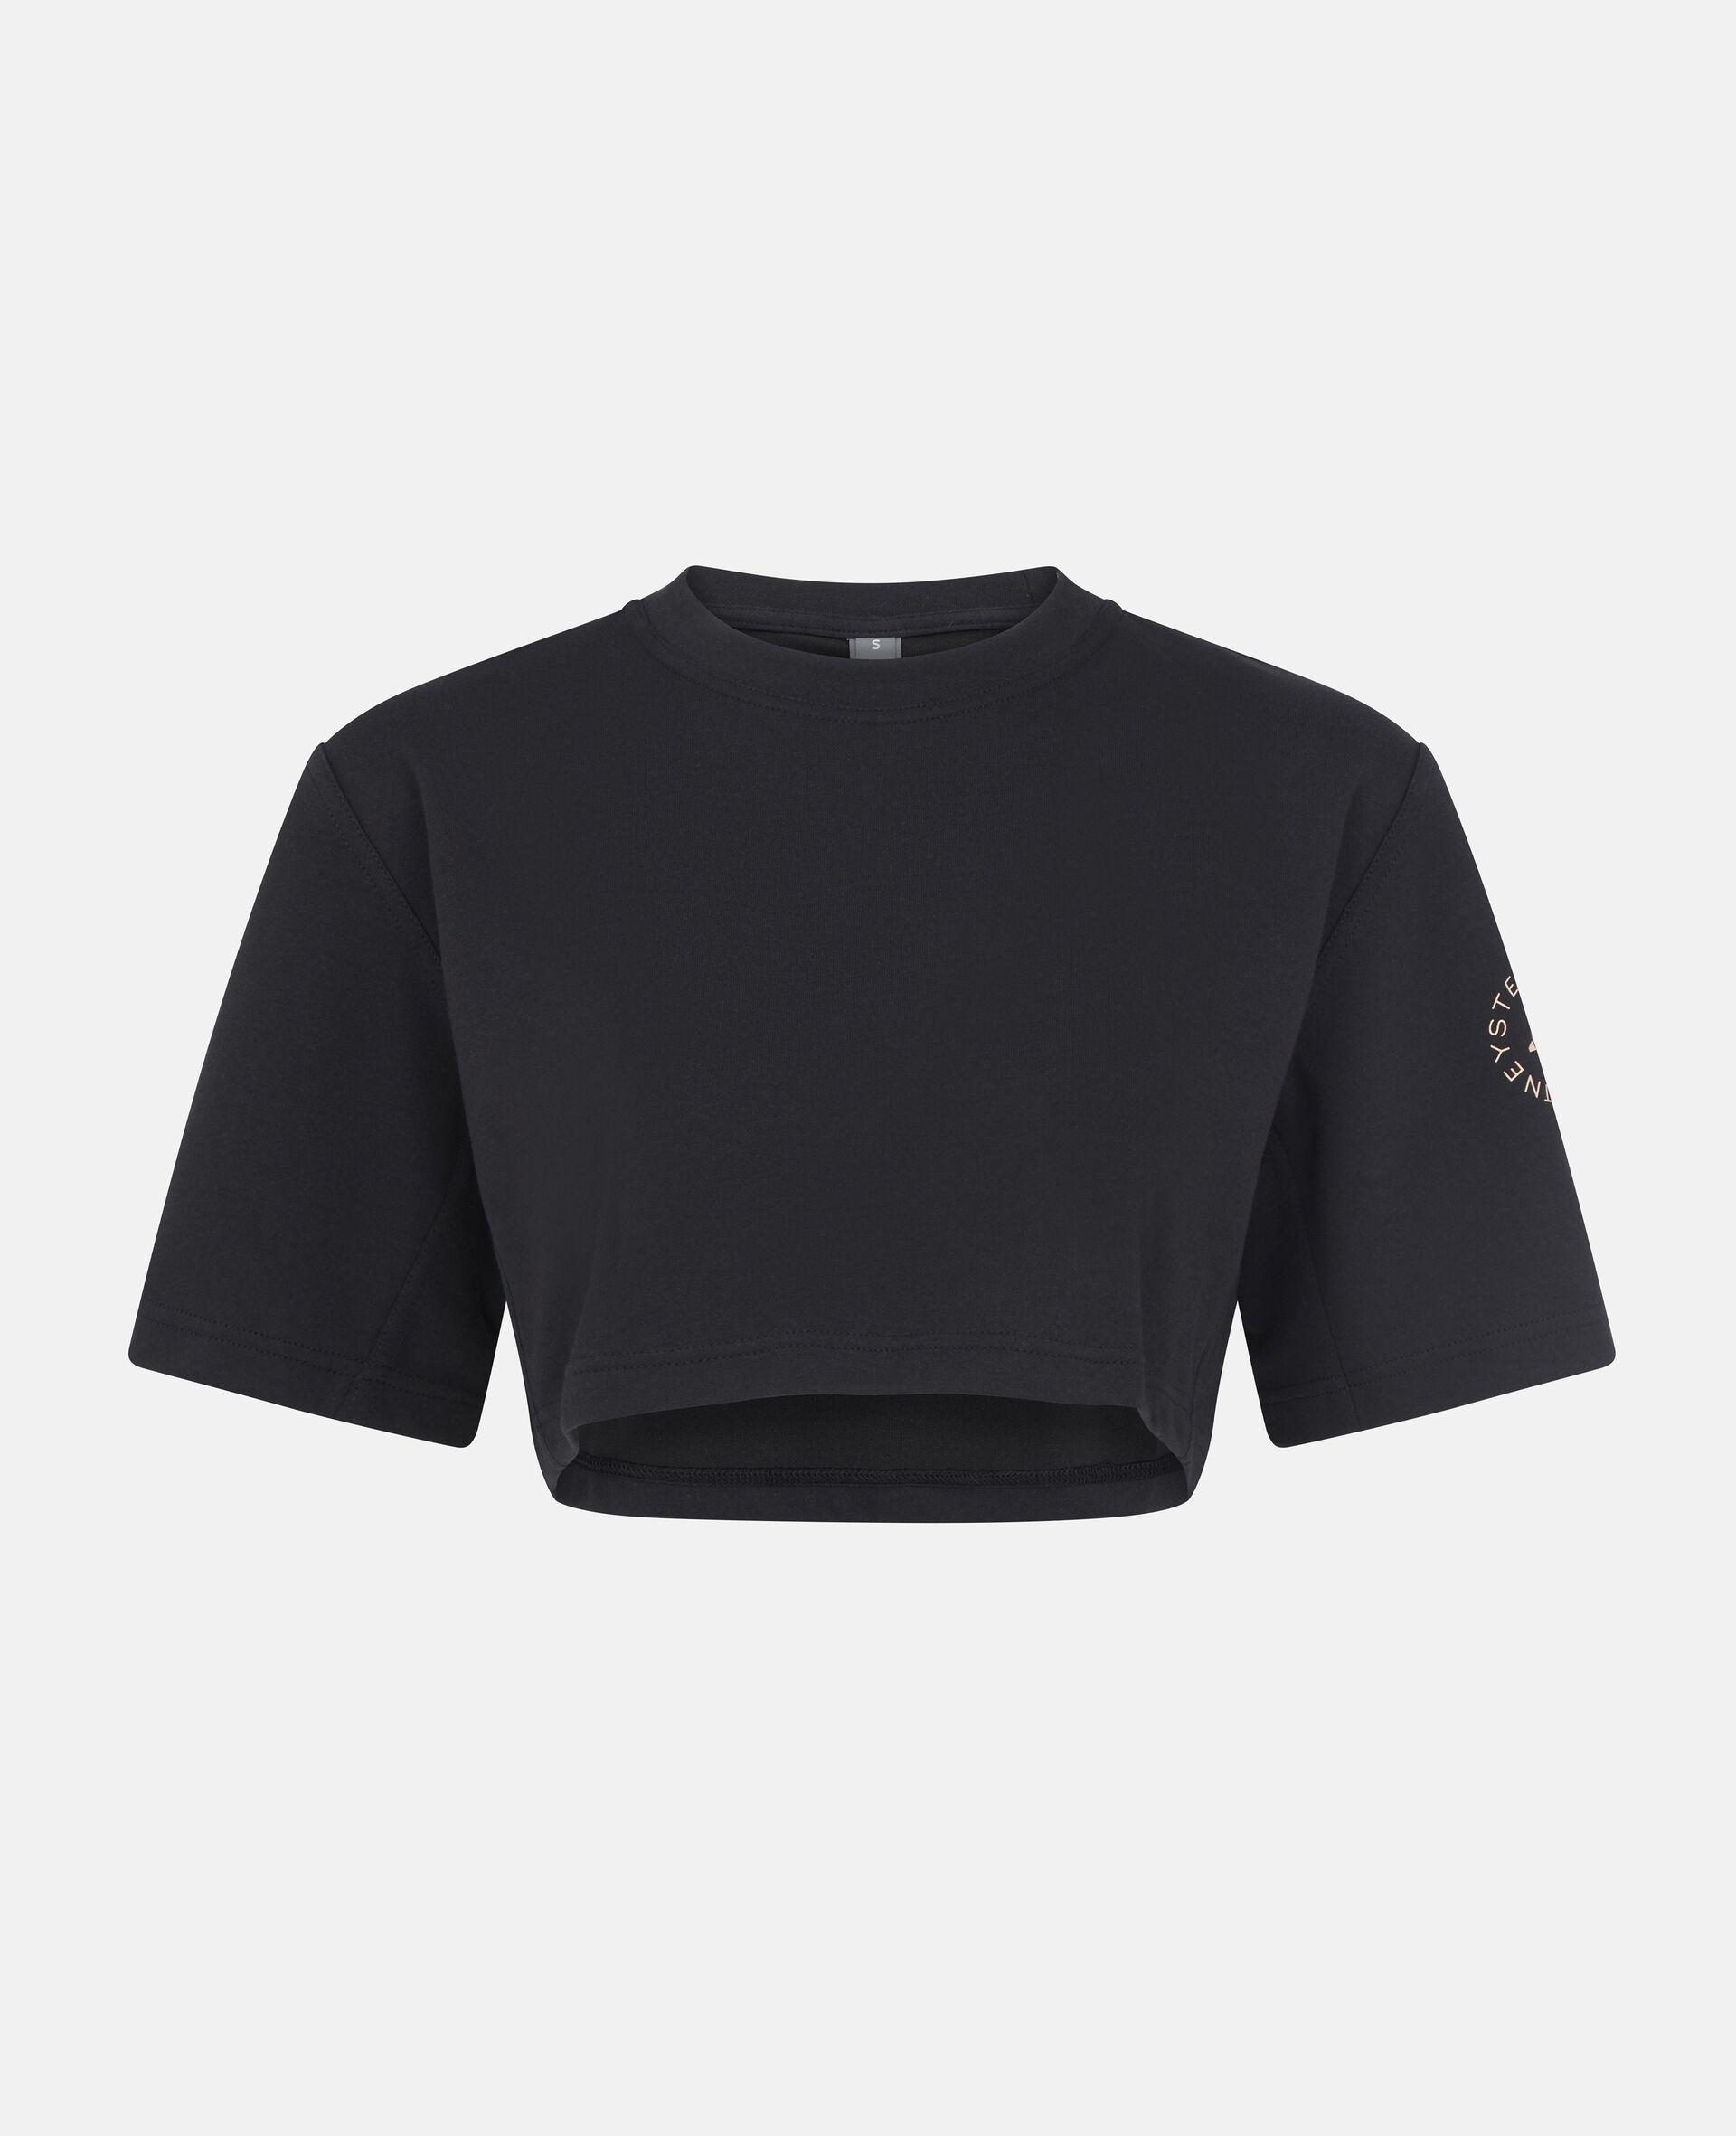 Black Training Cropped T-Shirt-Black-large image number 0